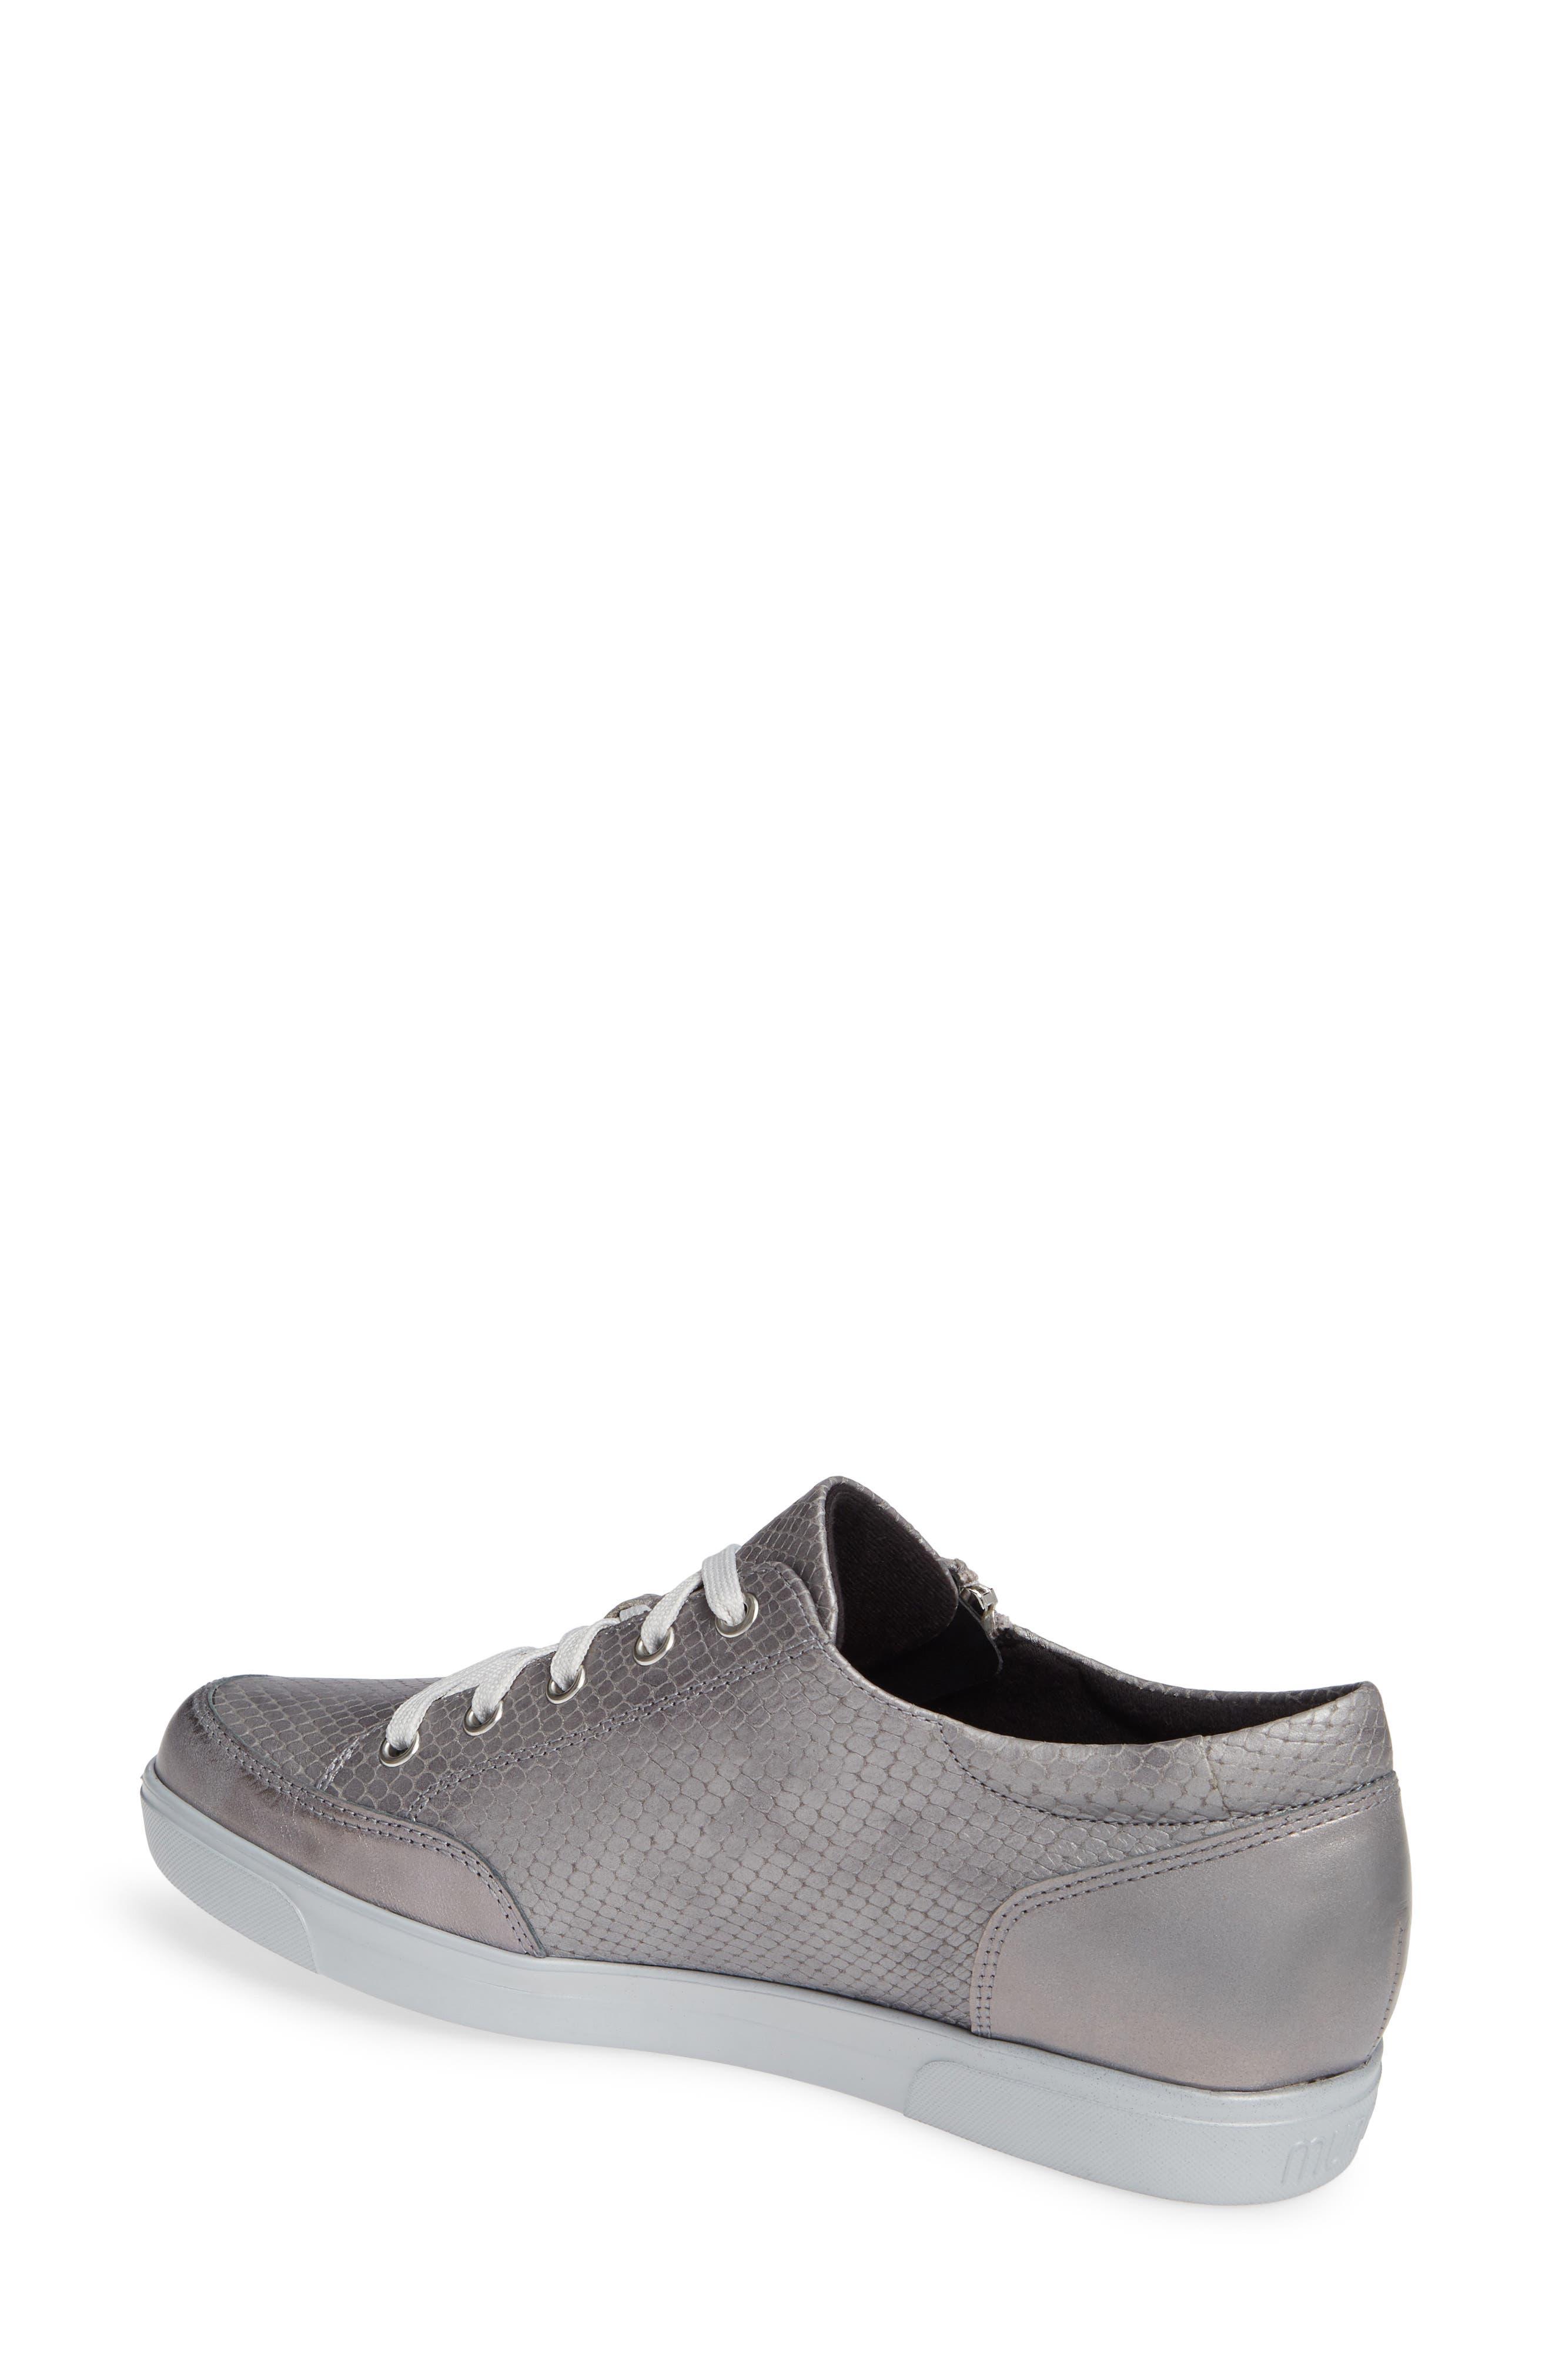 Gabbie Sneaker,                             Alternate thumbnail 2, color,                             LIGHT GREY LEATHER